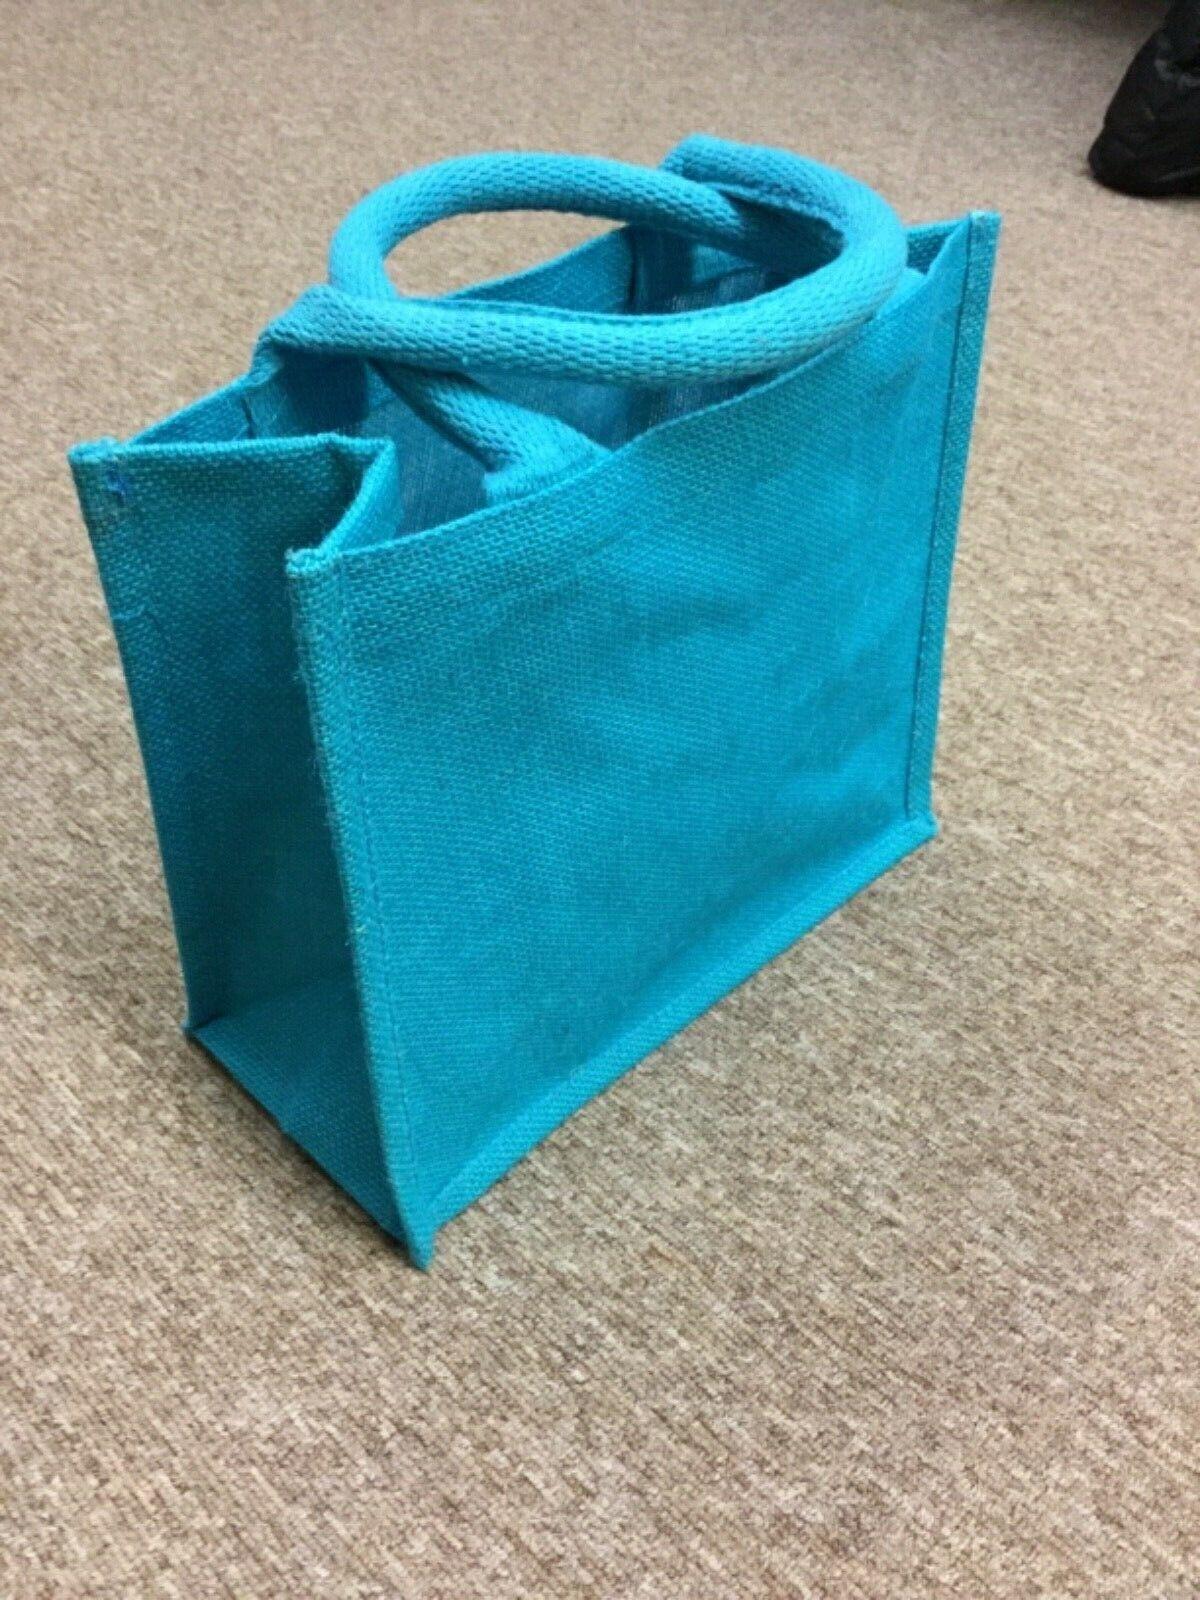 CORNISH JUTE JUTE JUTE MINI BAG (box of 100) (H) | Hohe Qualität und günstig  0abf8d